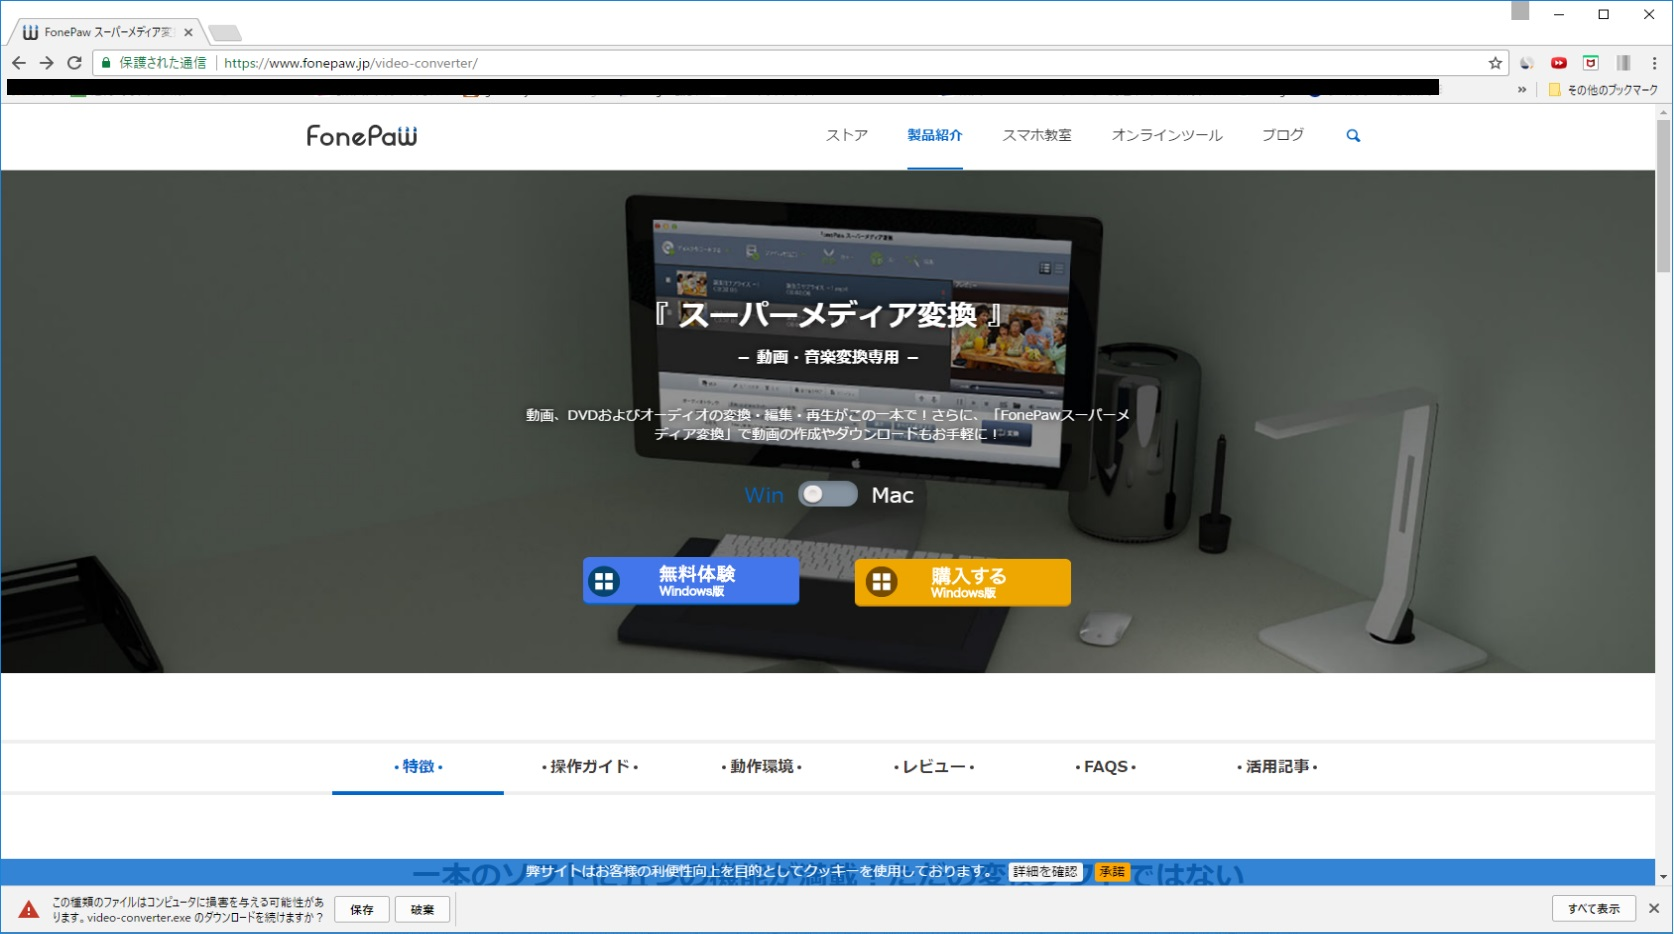 スーパーメディア変換2